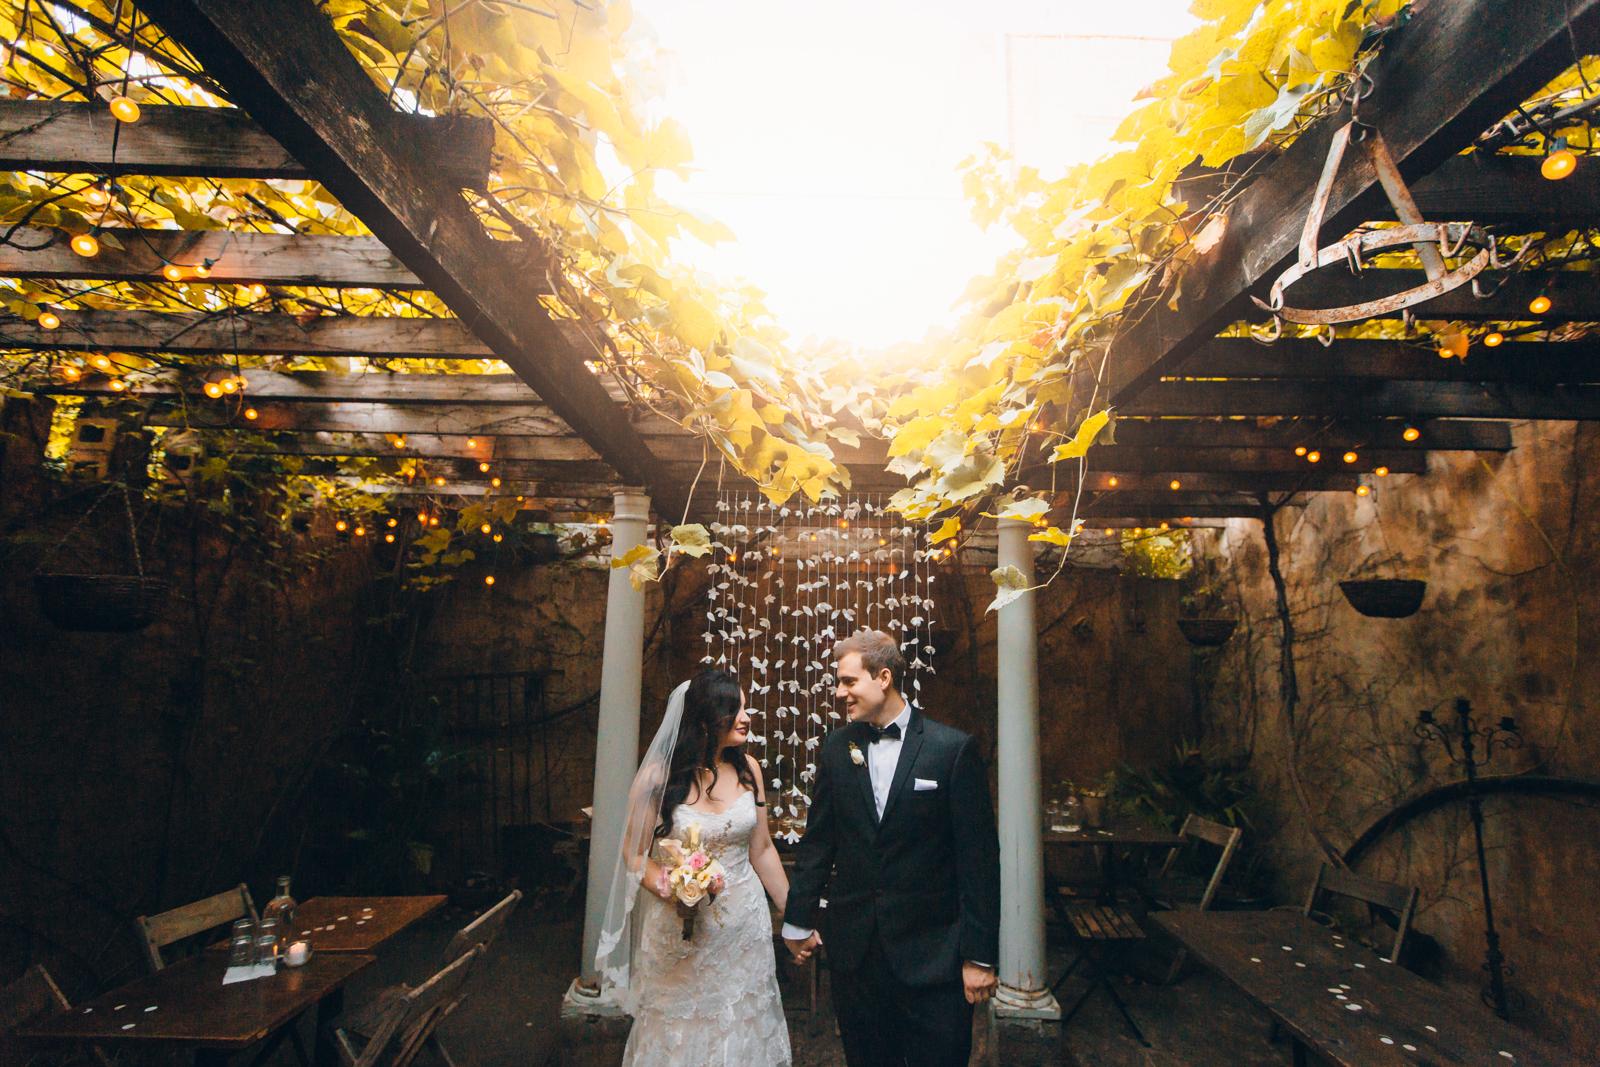 NYC Wedding Photography Lofts at Prince Brooklyn NYC Photographer Boris Zaretsky _B2C0493-Edit.jpg